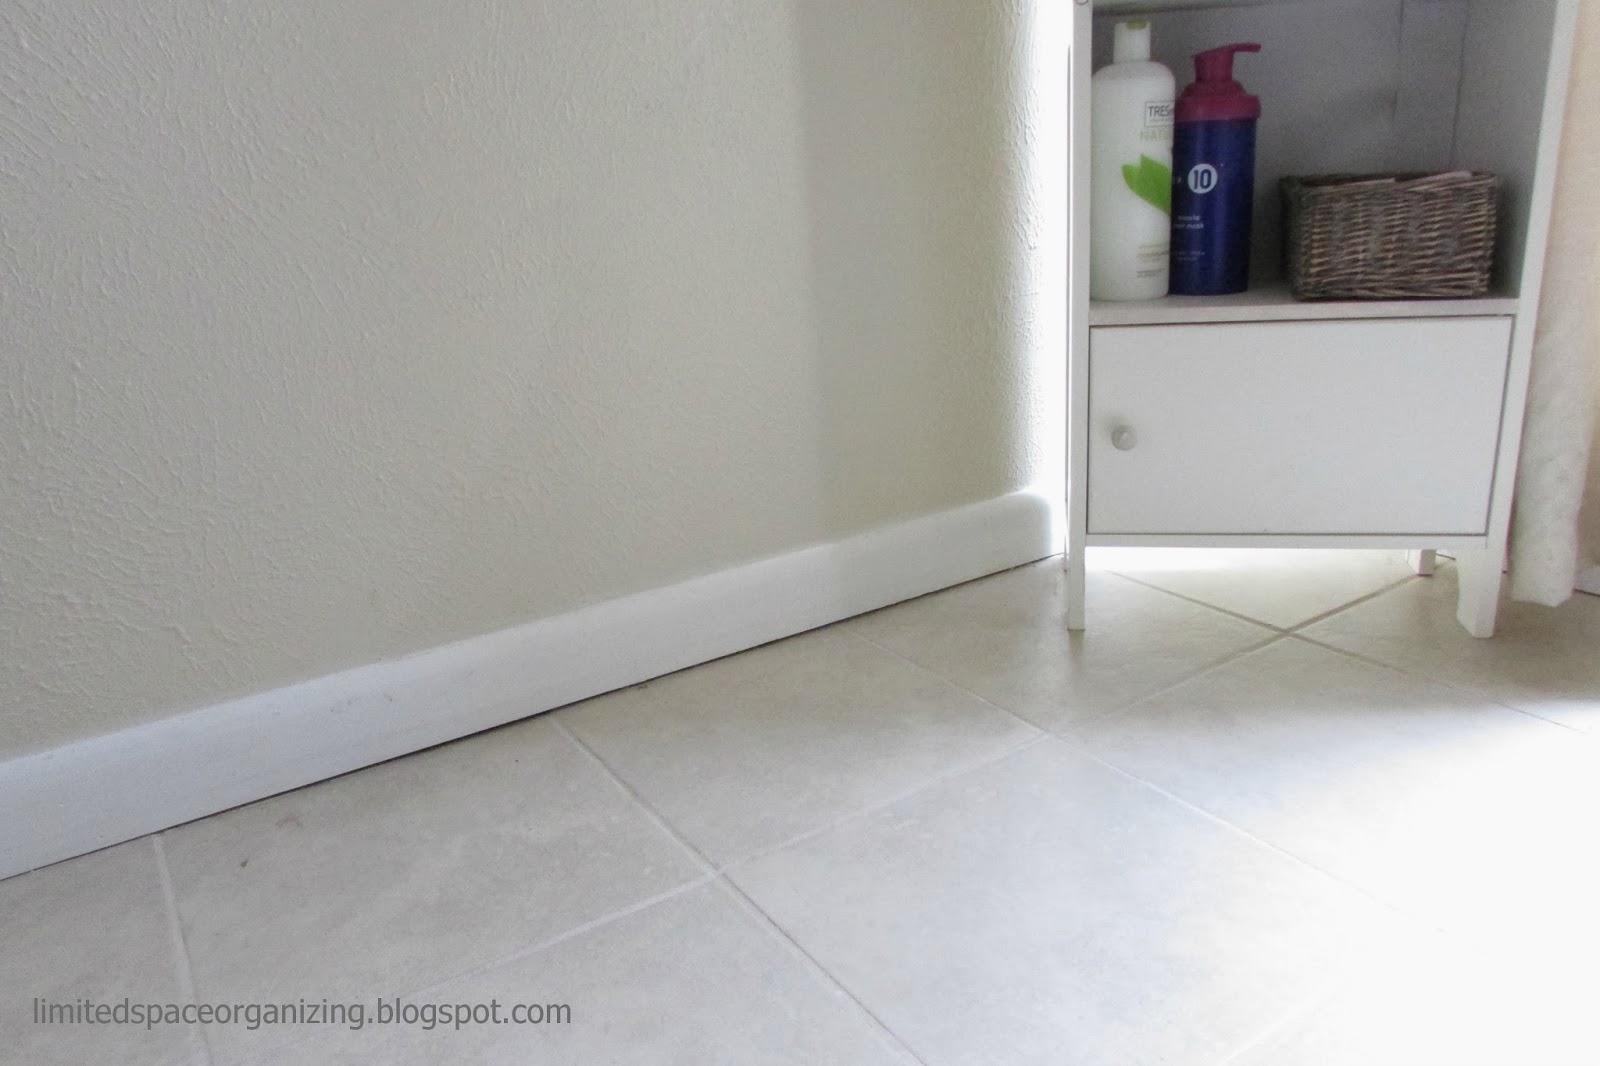 Limited Space Organizing Caulking The Bathroom